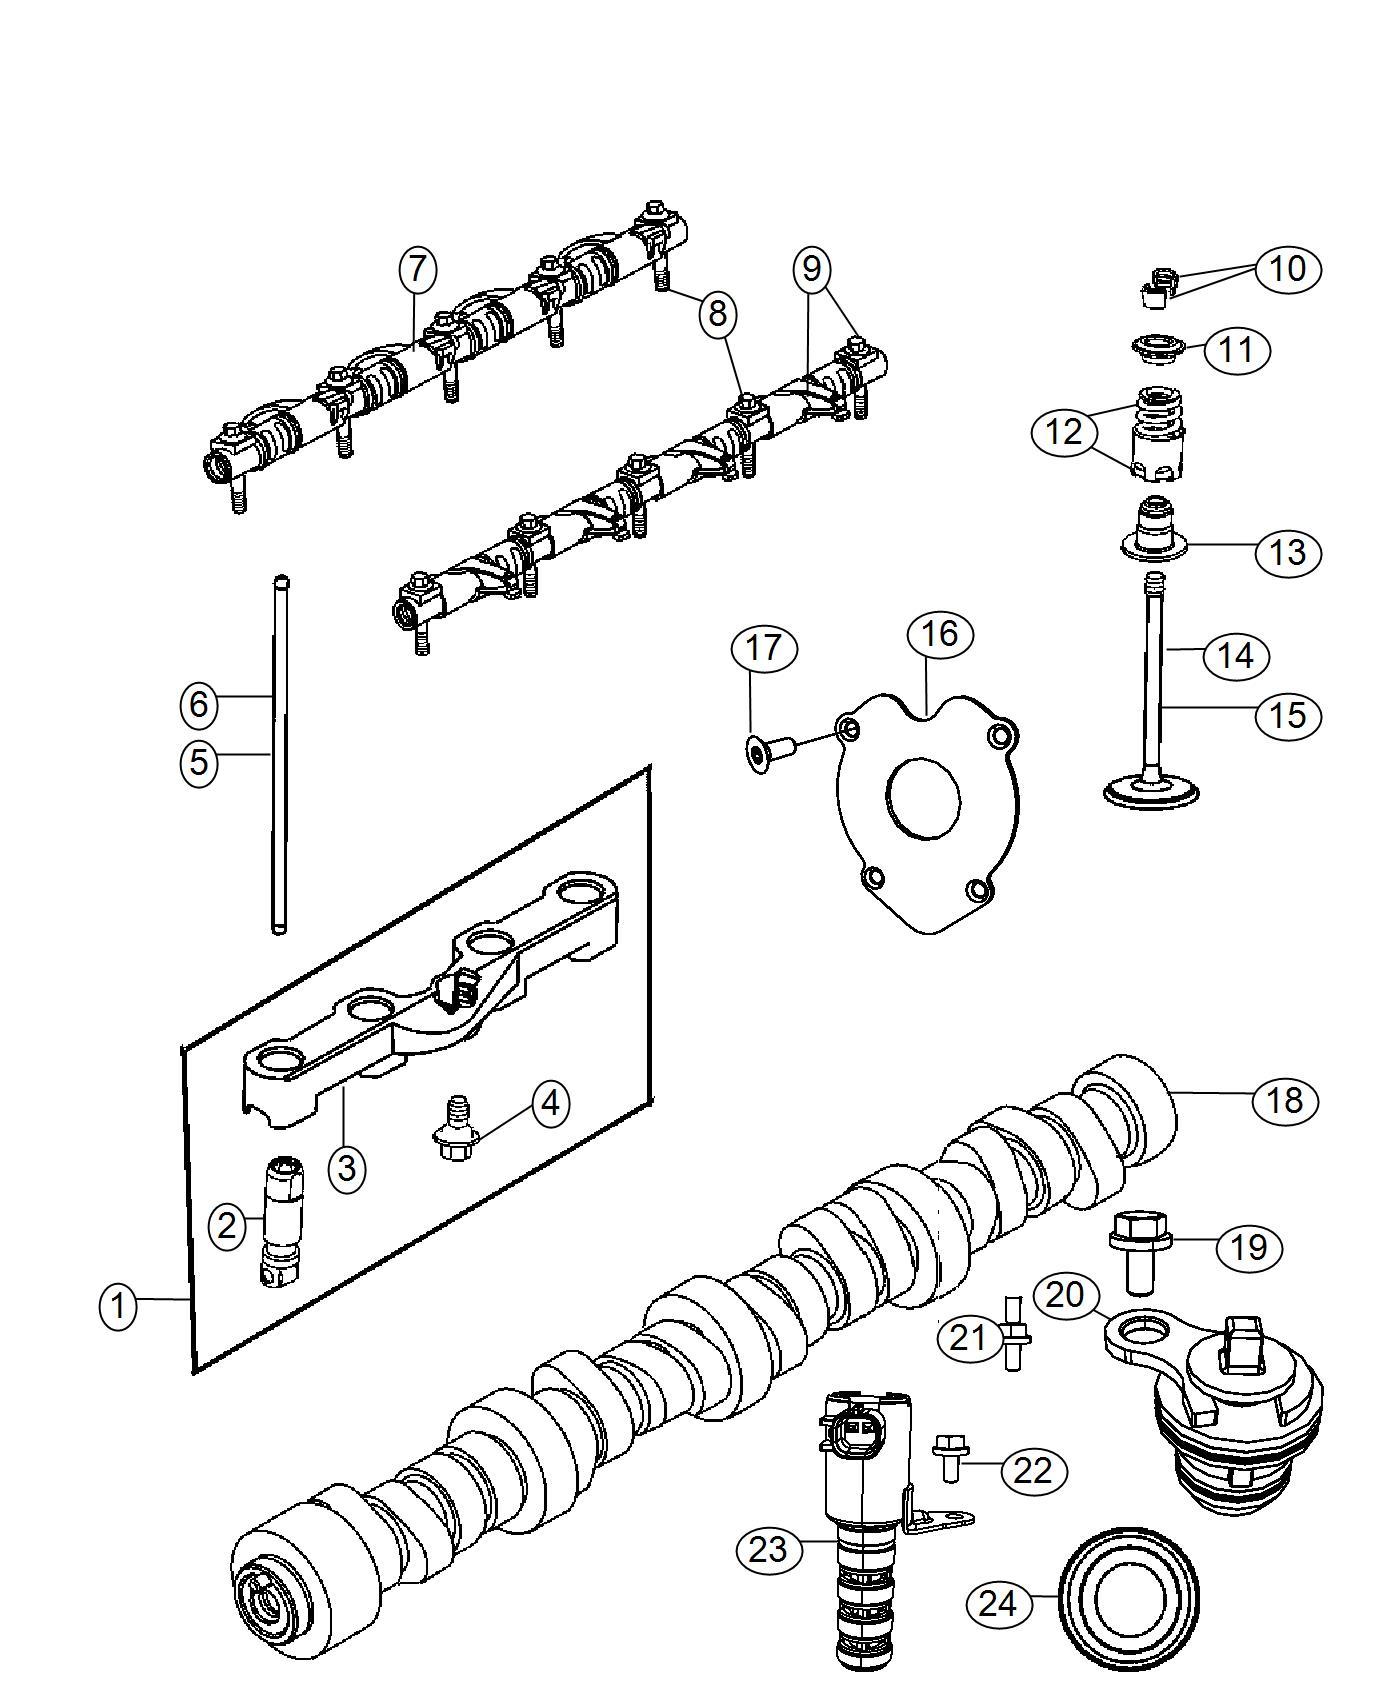 Ram 2500 Camshaft. Engine. Valvetrain, hemi, mds